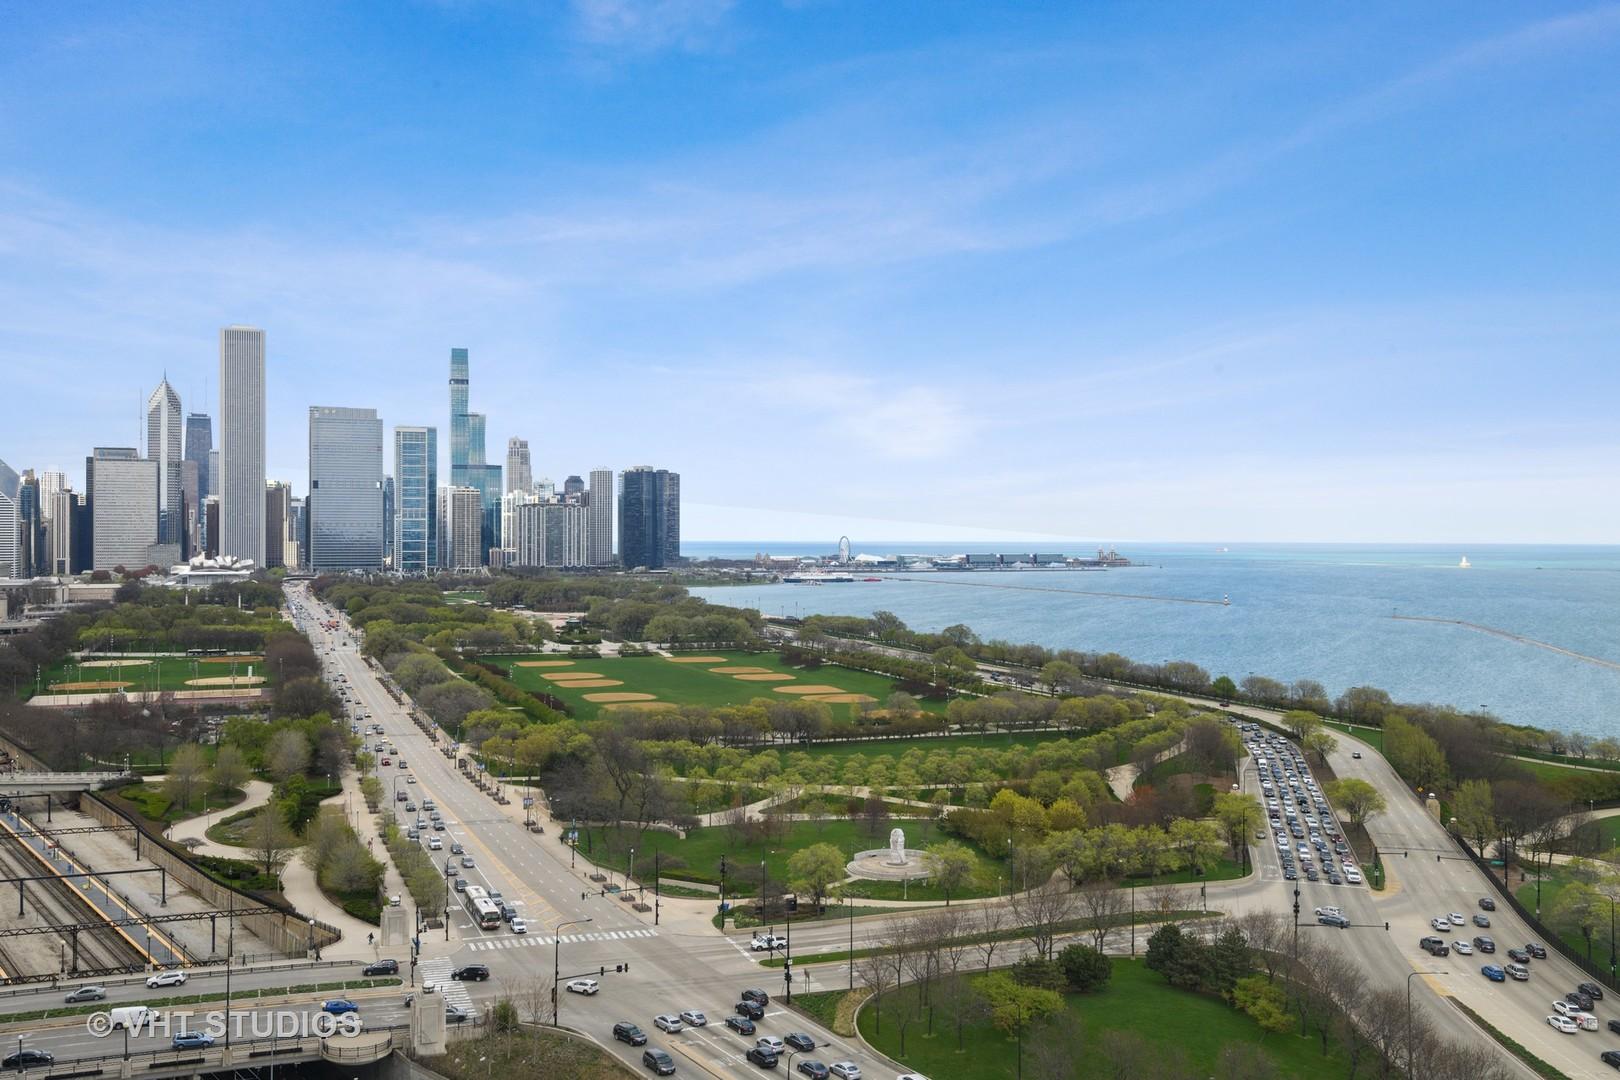 233 13th Unit Unit 2203 ,Chicago, Illinois 60605